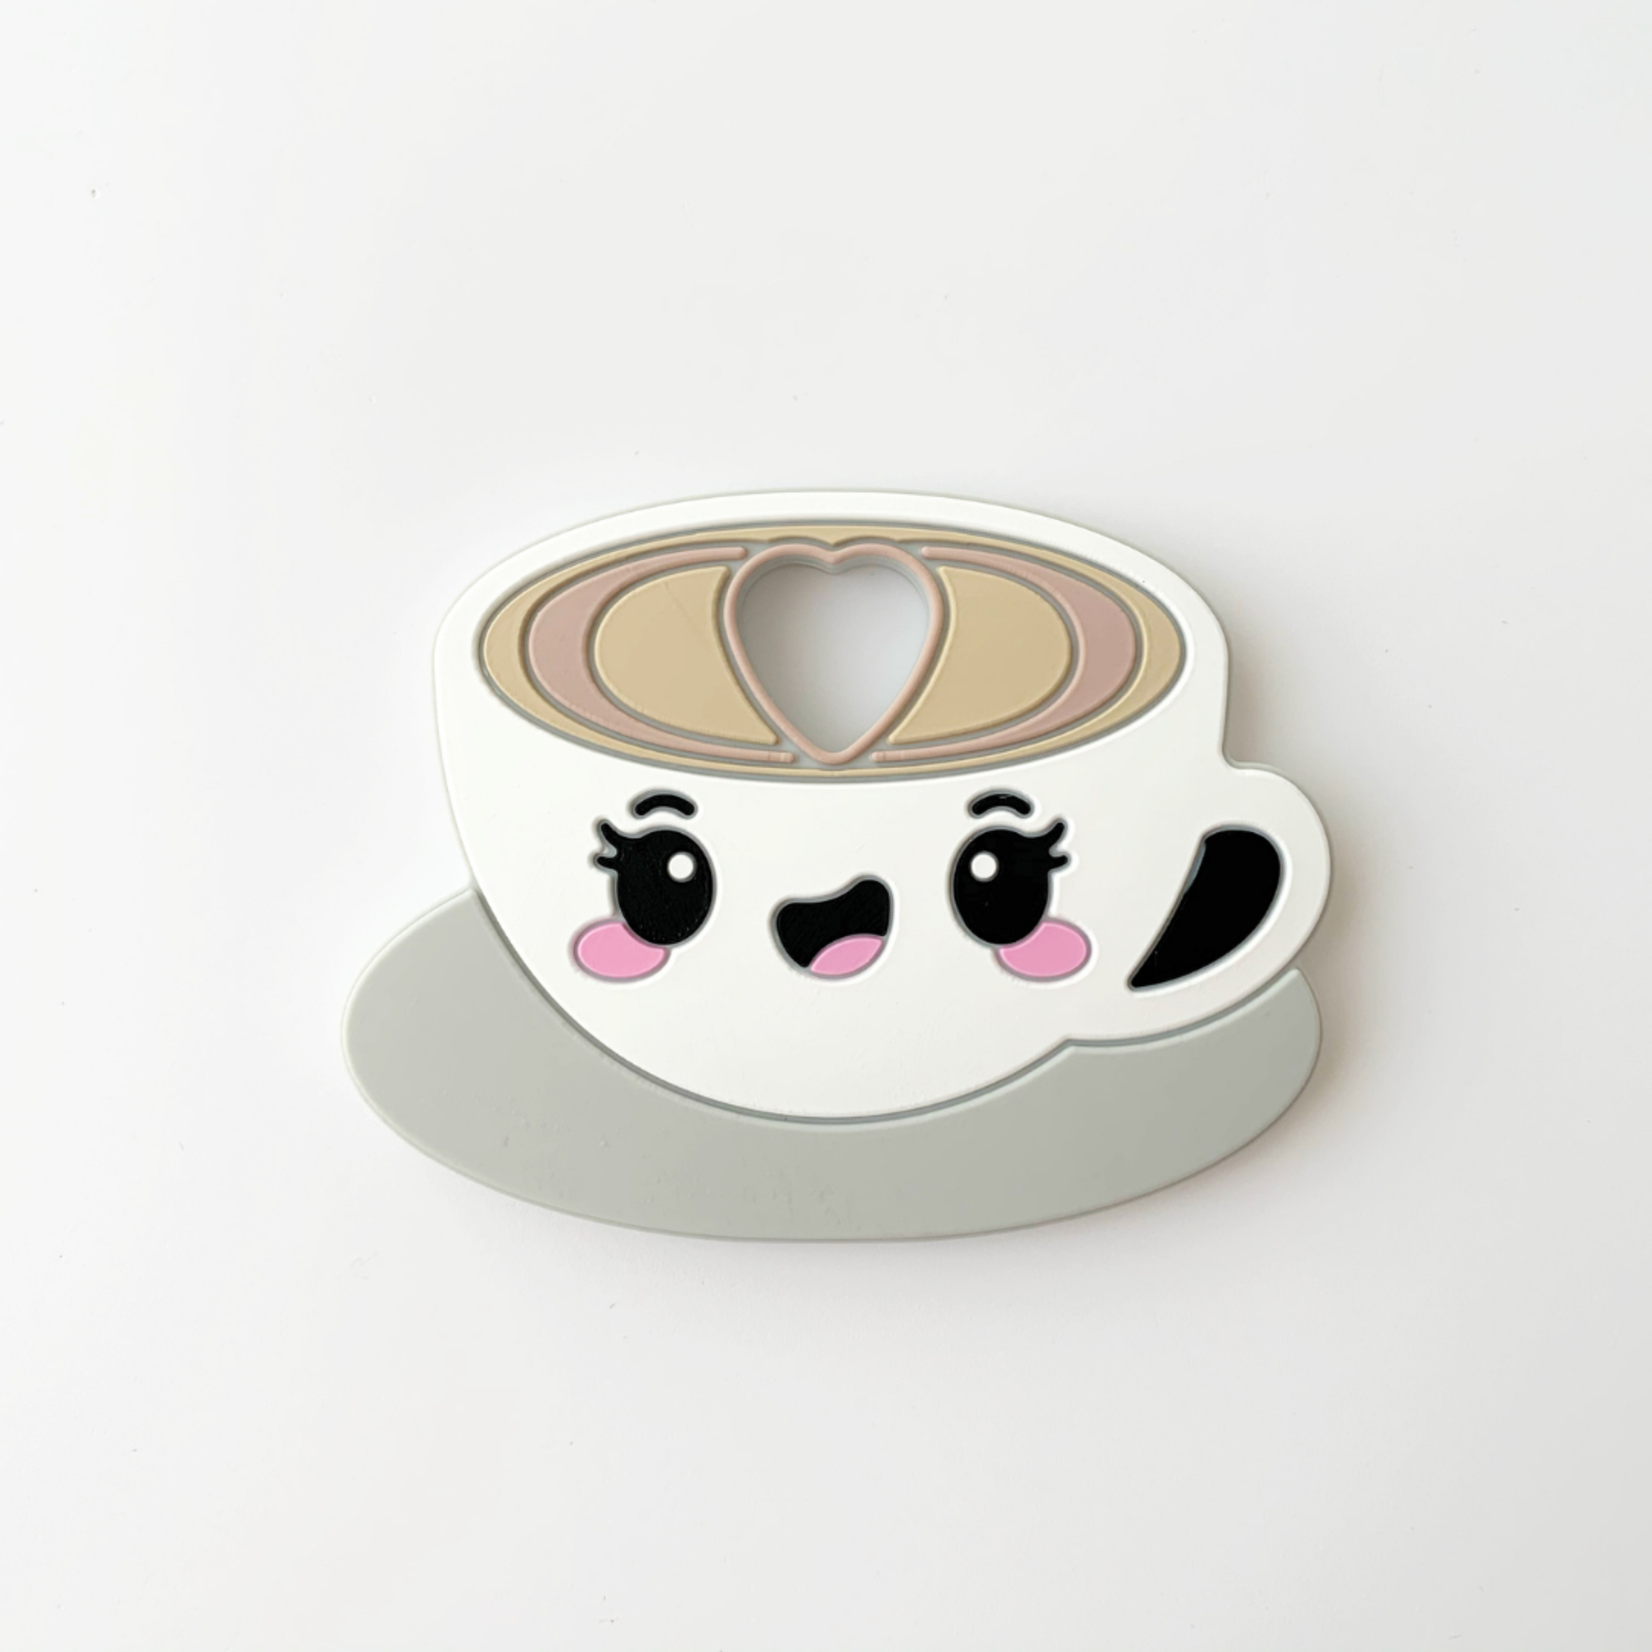 Jululu °° Jouet de dentition   Café latte